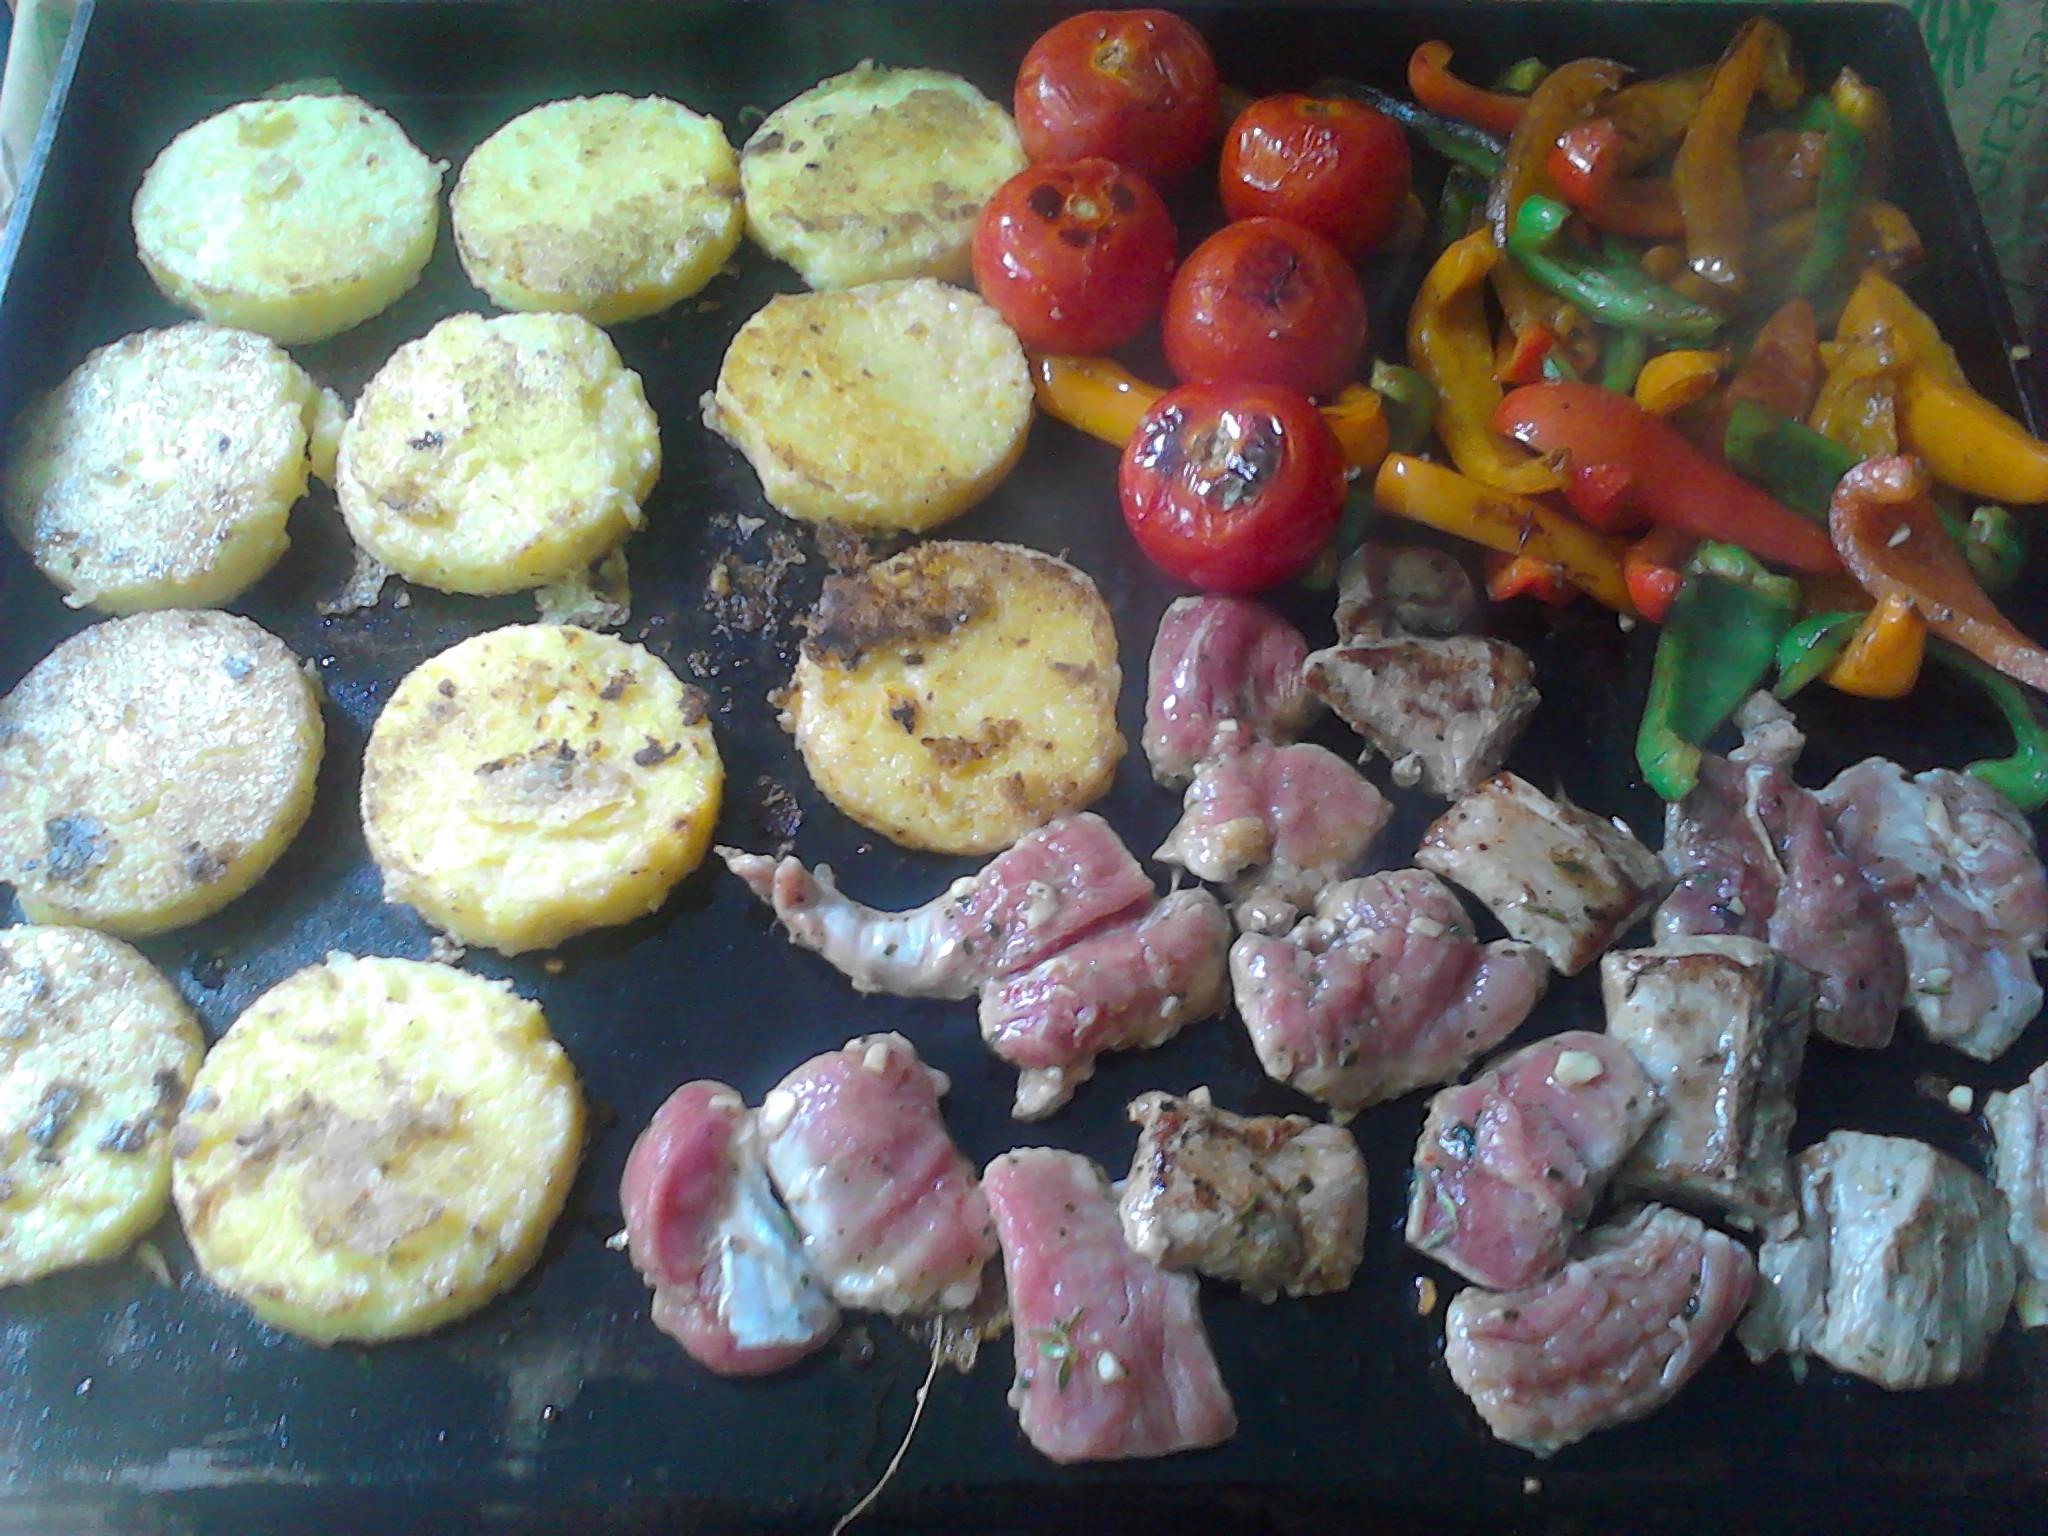 Plancha de filet mignon de porc marin s poivrons et galettes de polenta crou - Cuisiner a la plancha electrique ...